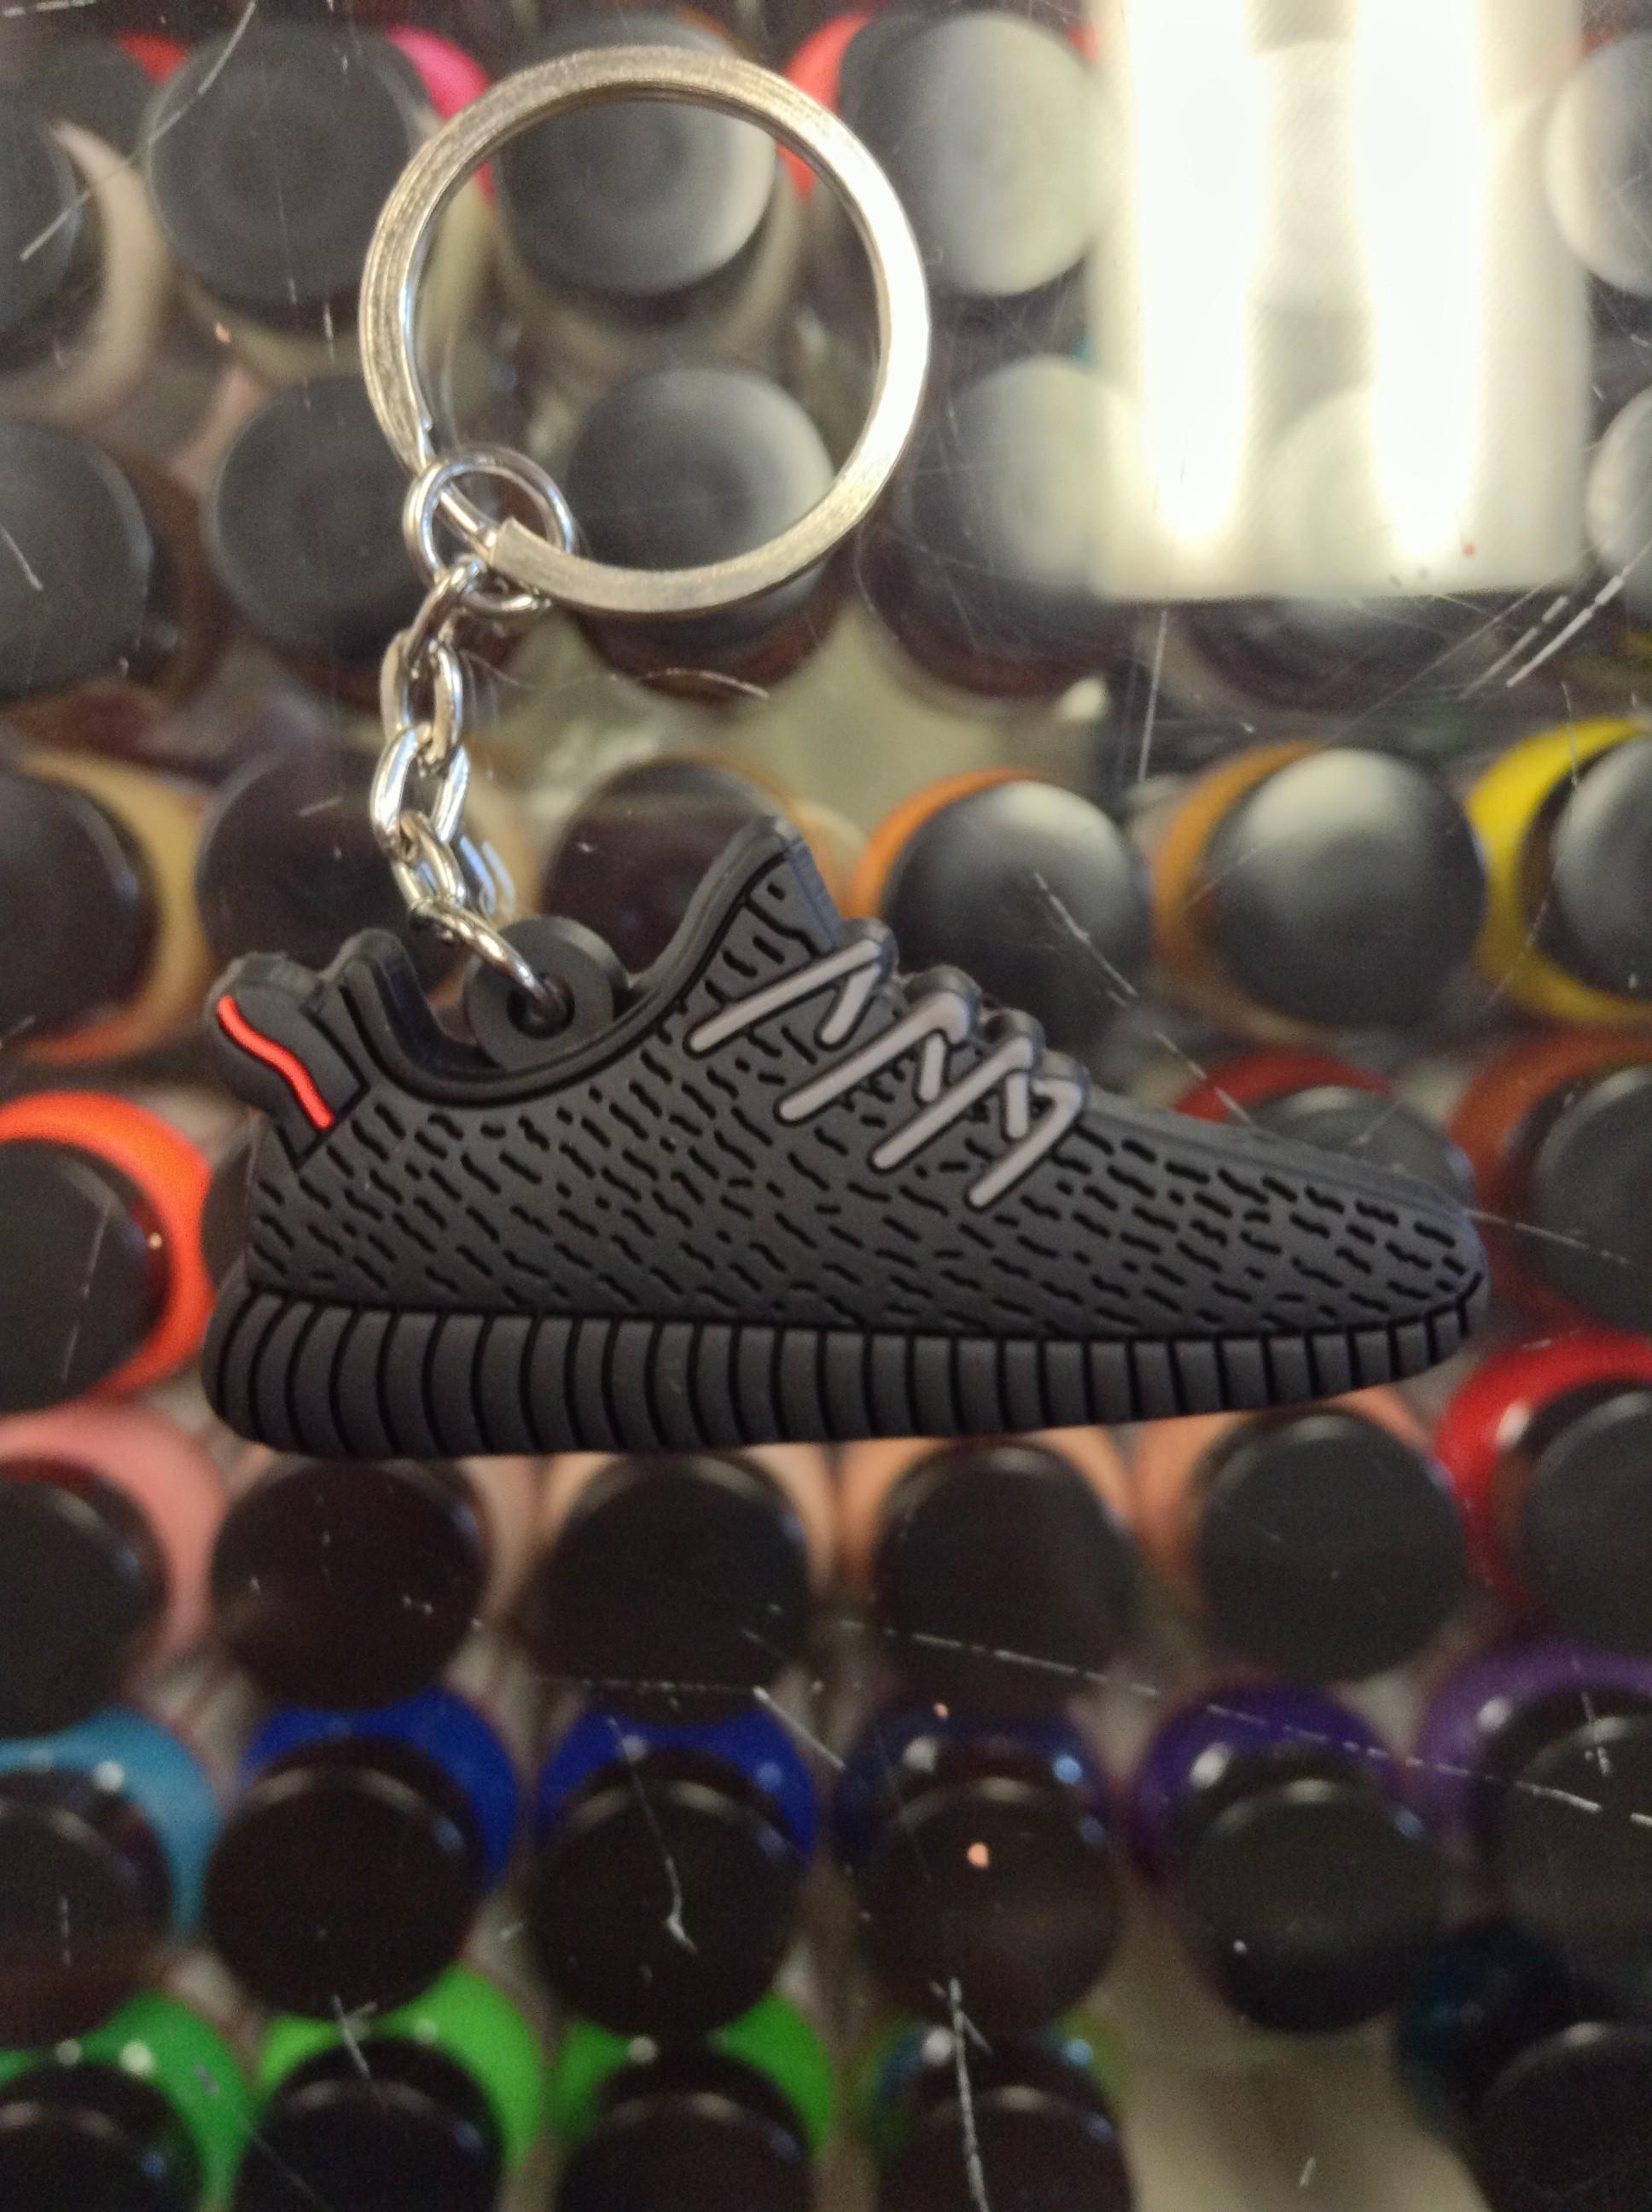 6edbefc50c01a 2015 Adidas Yeezy Boost 350 Pirate Black Red Stripe 2D Keychain ...